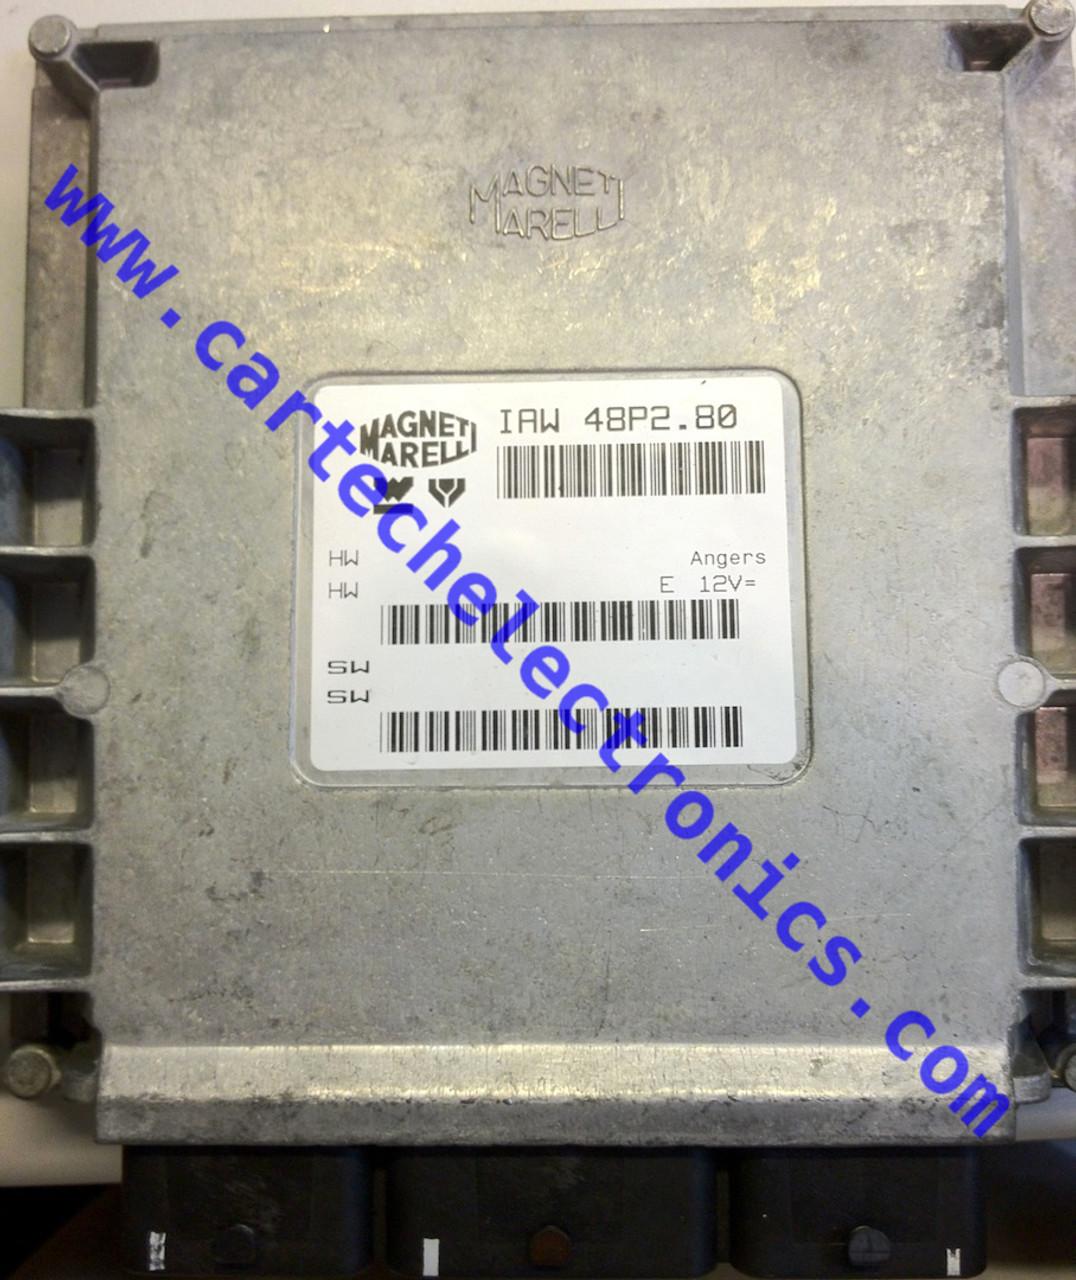 Citroen Saxo VTS / Peugeot 106 GTi 1.6 16v, IAW 48P2.80, HW 16.455.034, HW 9642774380, SW 16.448.064, SW 9647558780